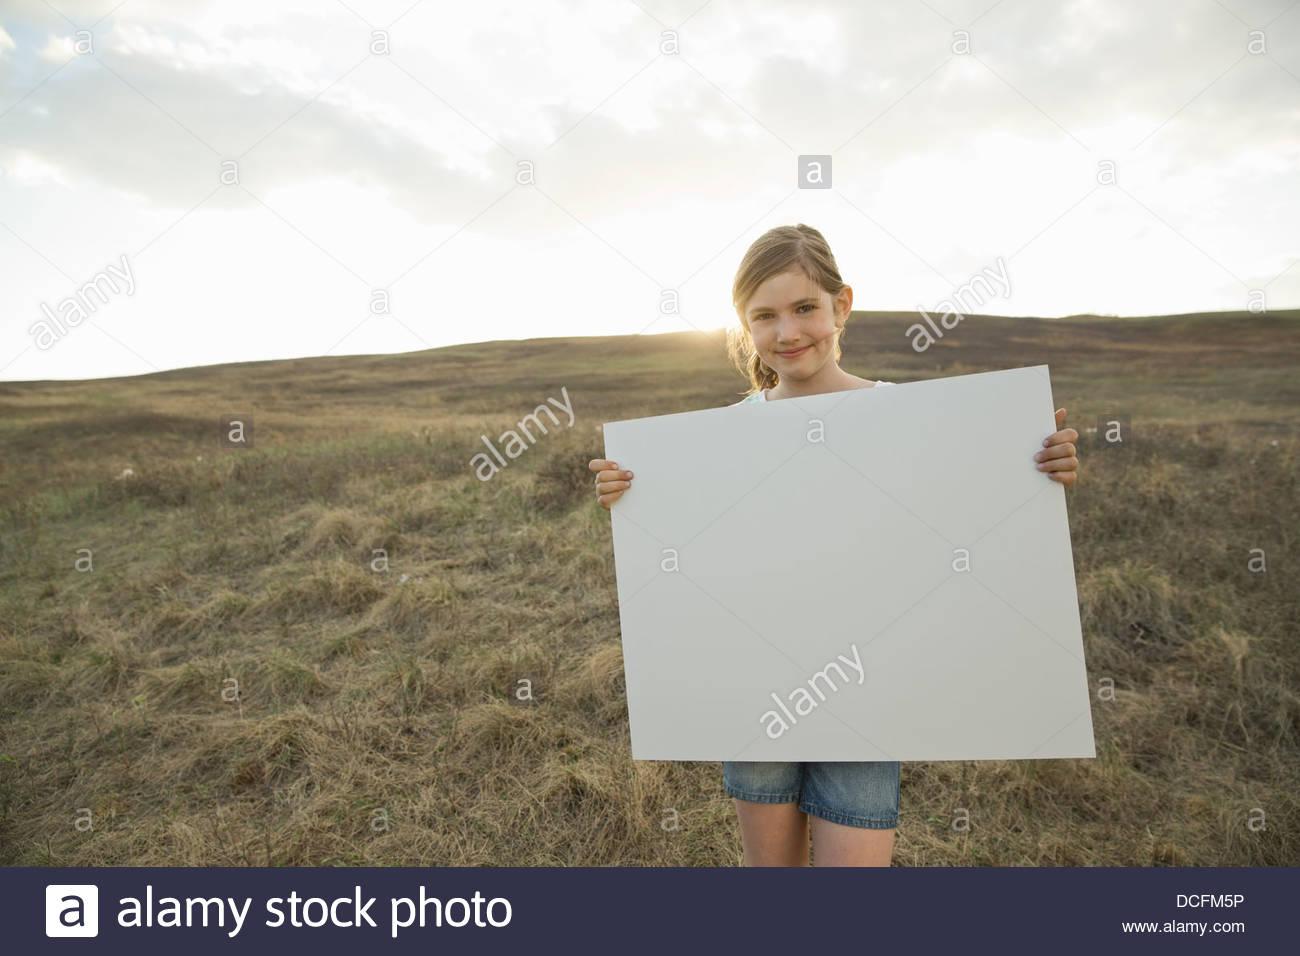 Portrait of smiling girl on hillside holding blank sign board - Stock Image